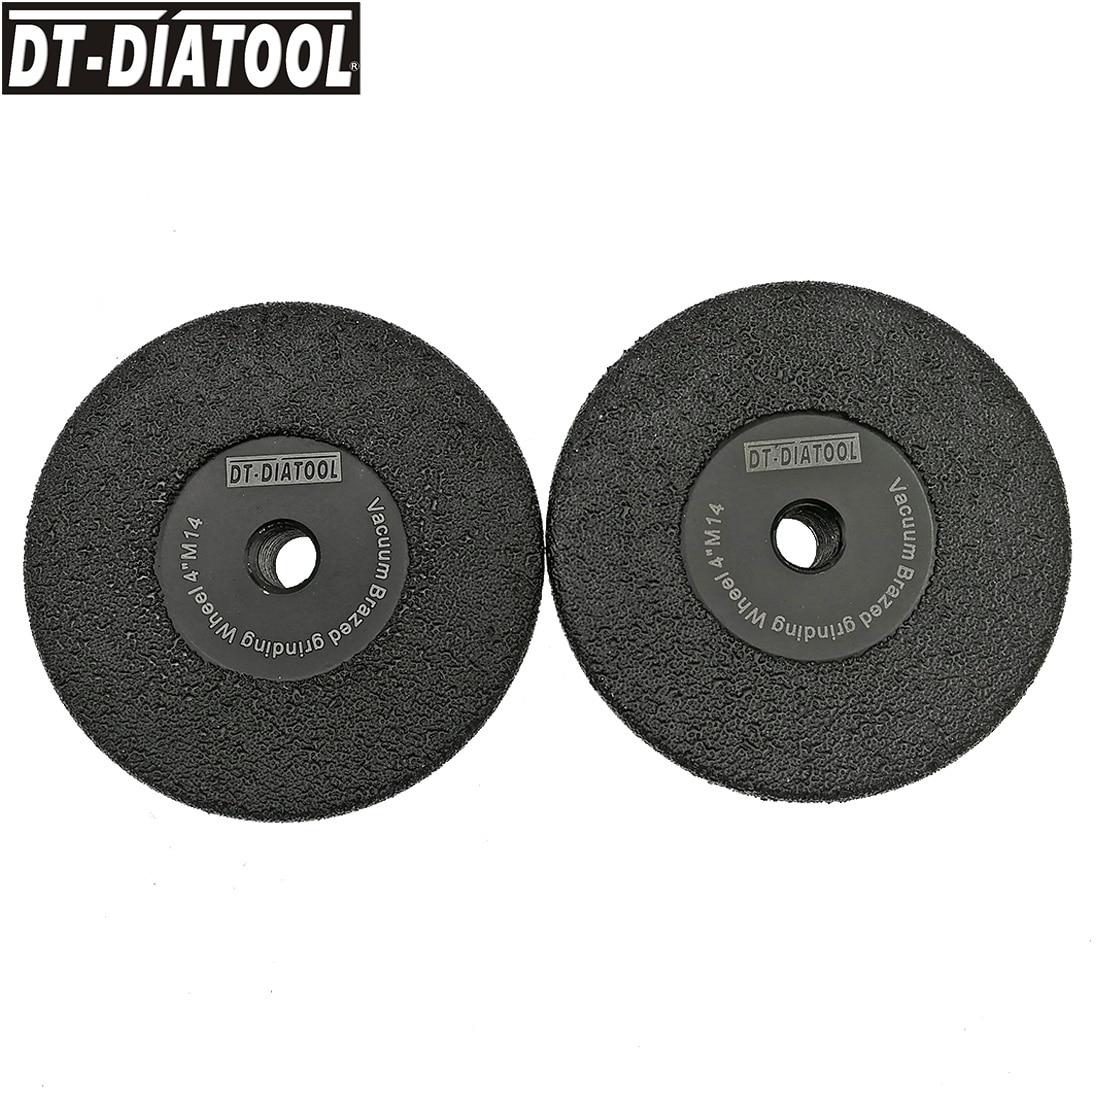 DT-DIATOOL 2 قطعة فريك #30 فراغ صنع من النحاس الماس شقة طحن عجلة M14 موضوع تشكيل القرص ضياء 4